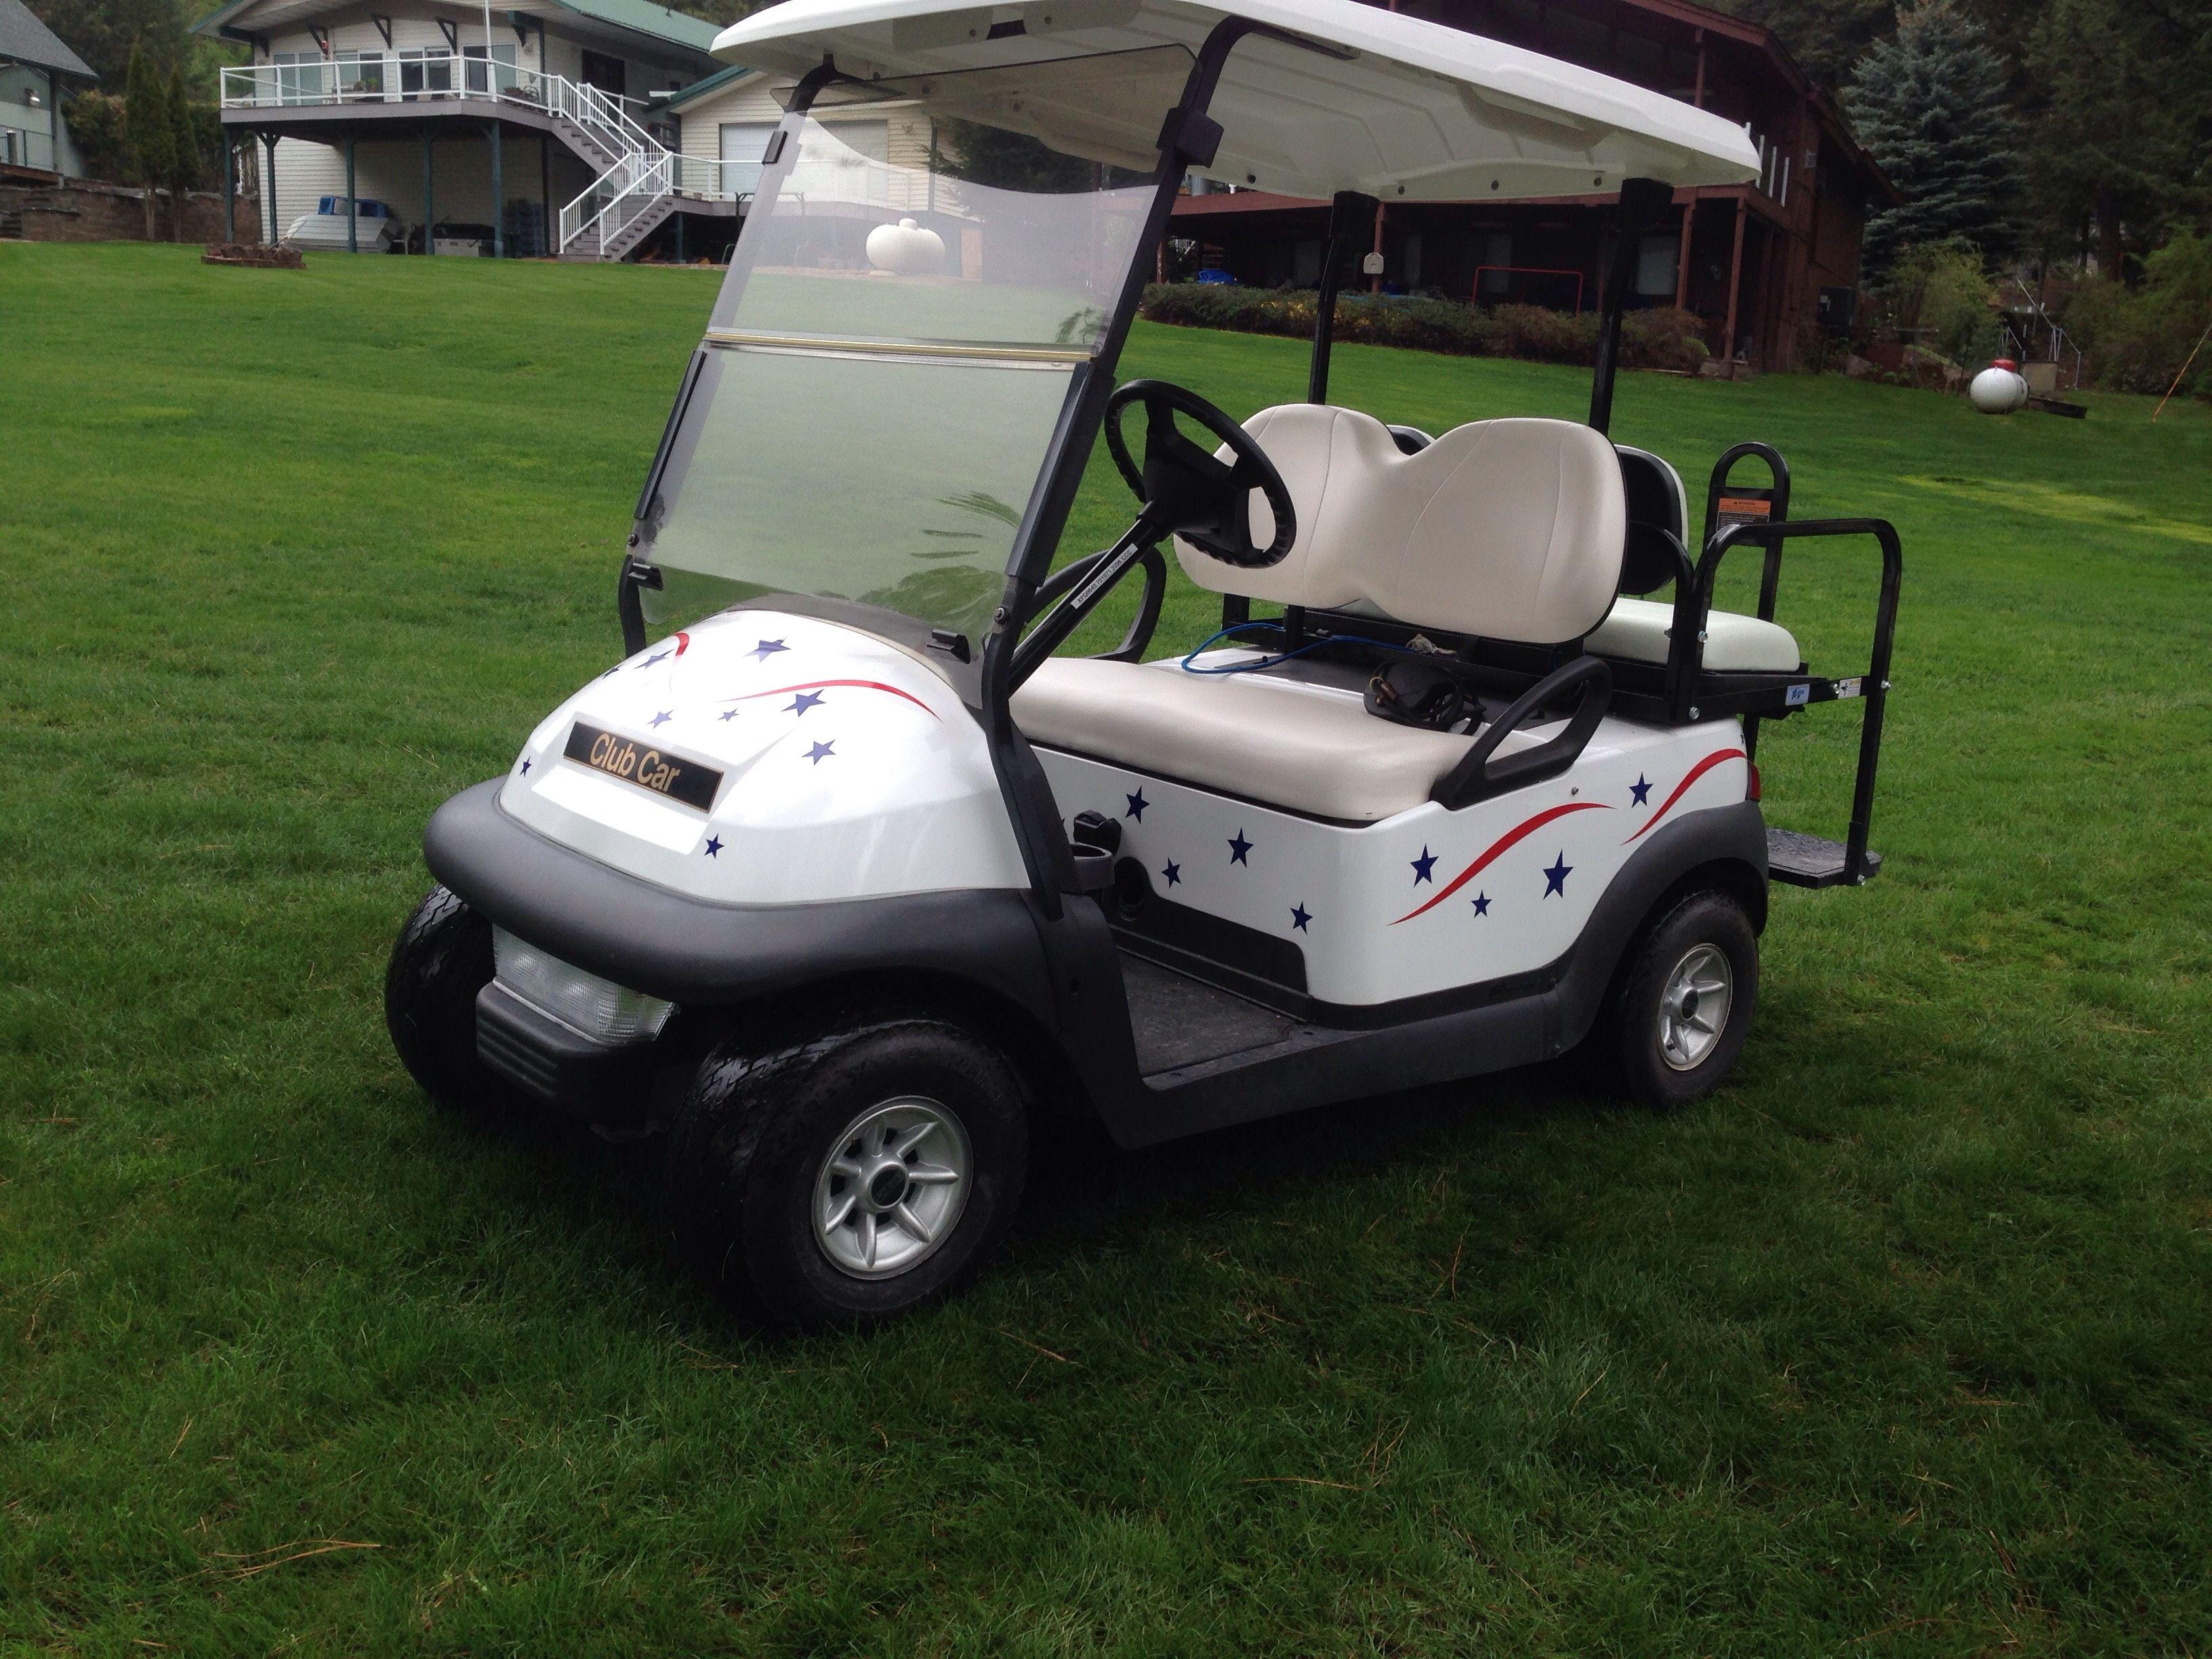 Pin by StickerChef on Golf Carts Go Karts Decals Stickers ... Gator Golf Cart Decals on gator utility cart, gator atv, sun mountain cart, used ez go electric cart, gator motorsports go cart,